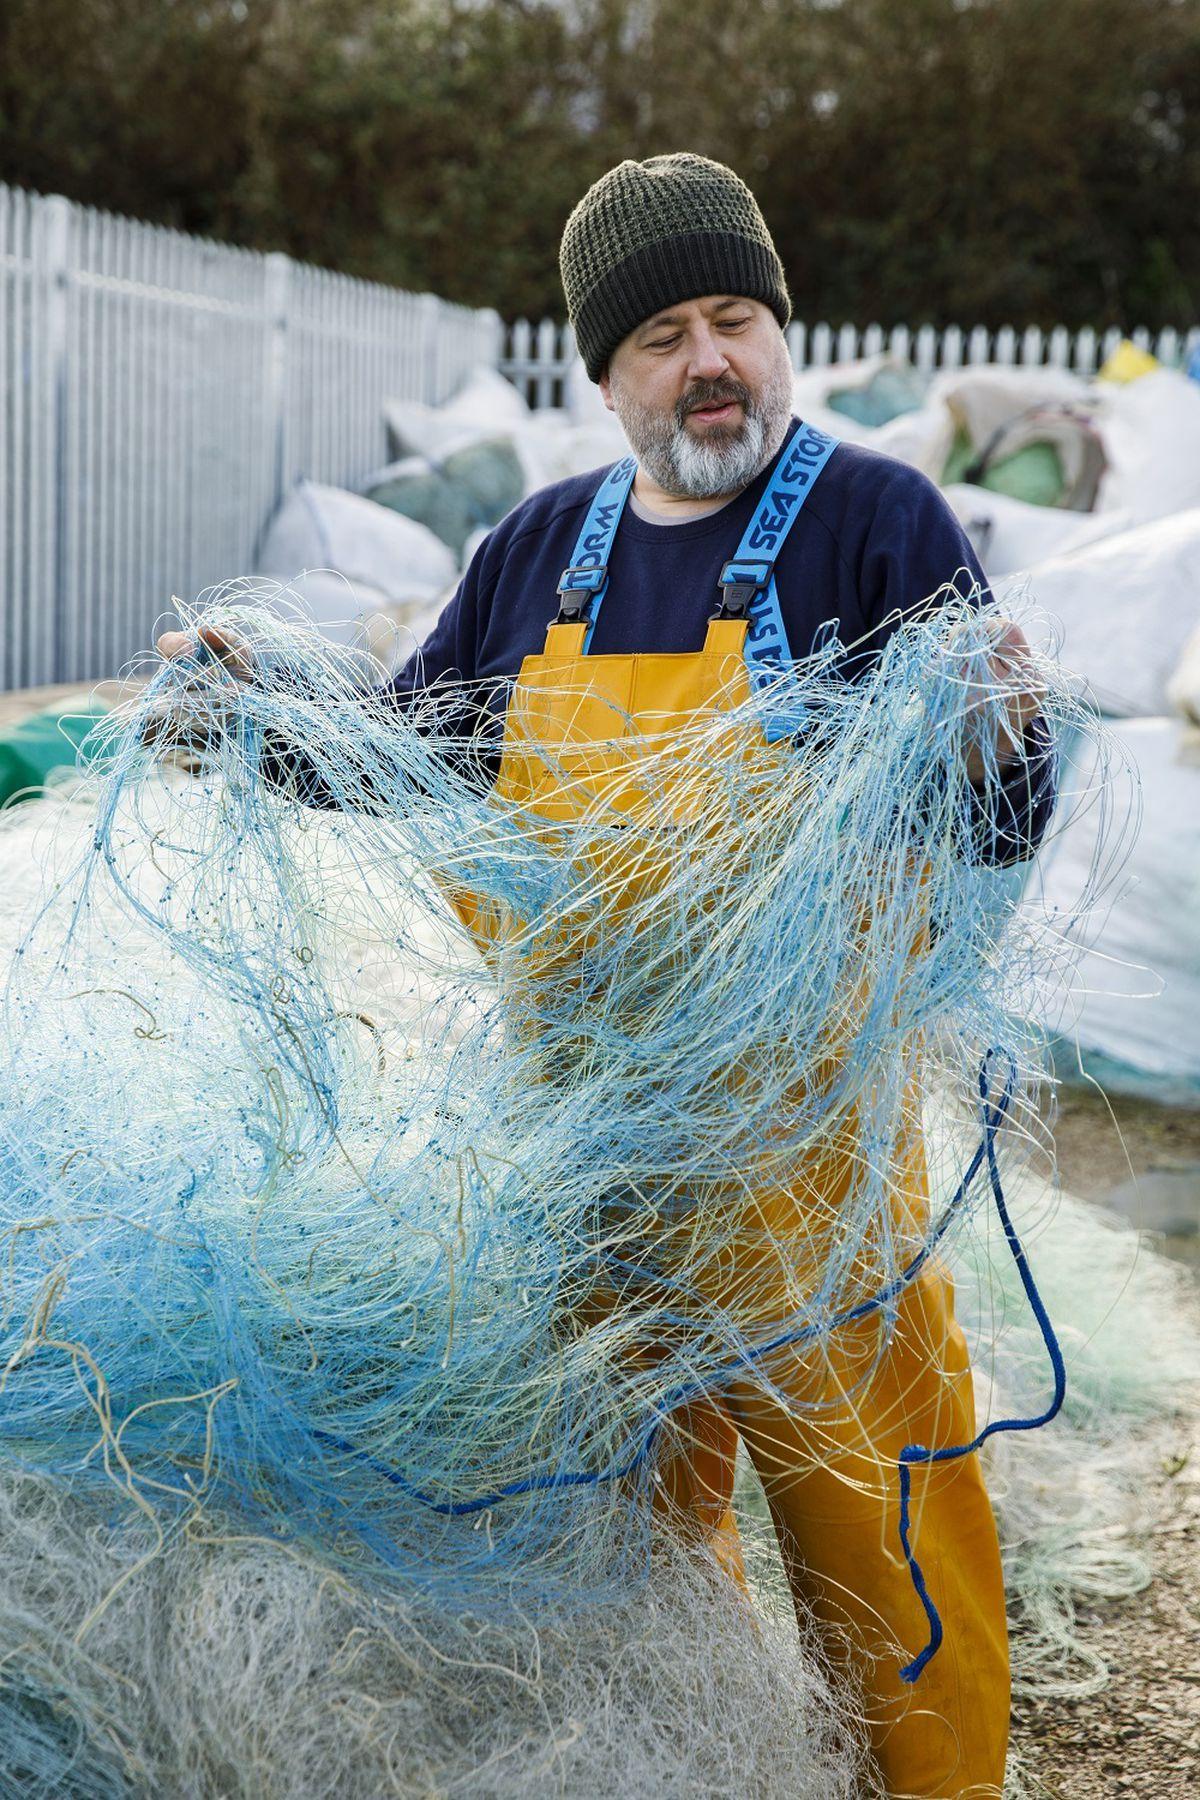 Ian Falconer with the recycled nylon fishing nets into engineering grade filament